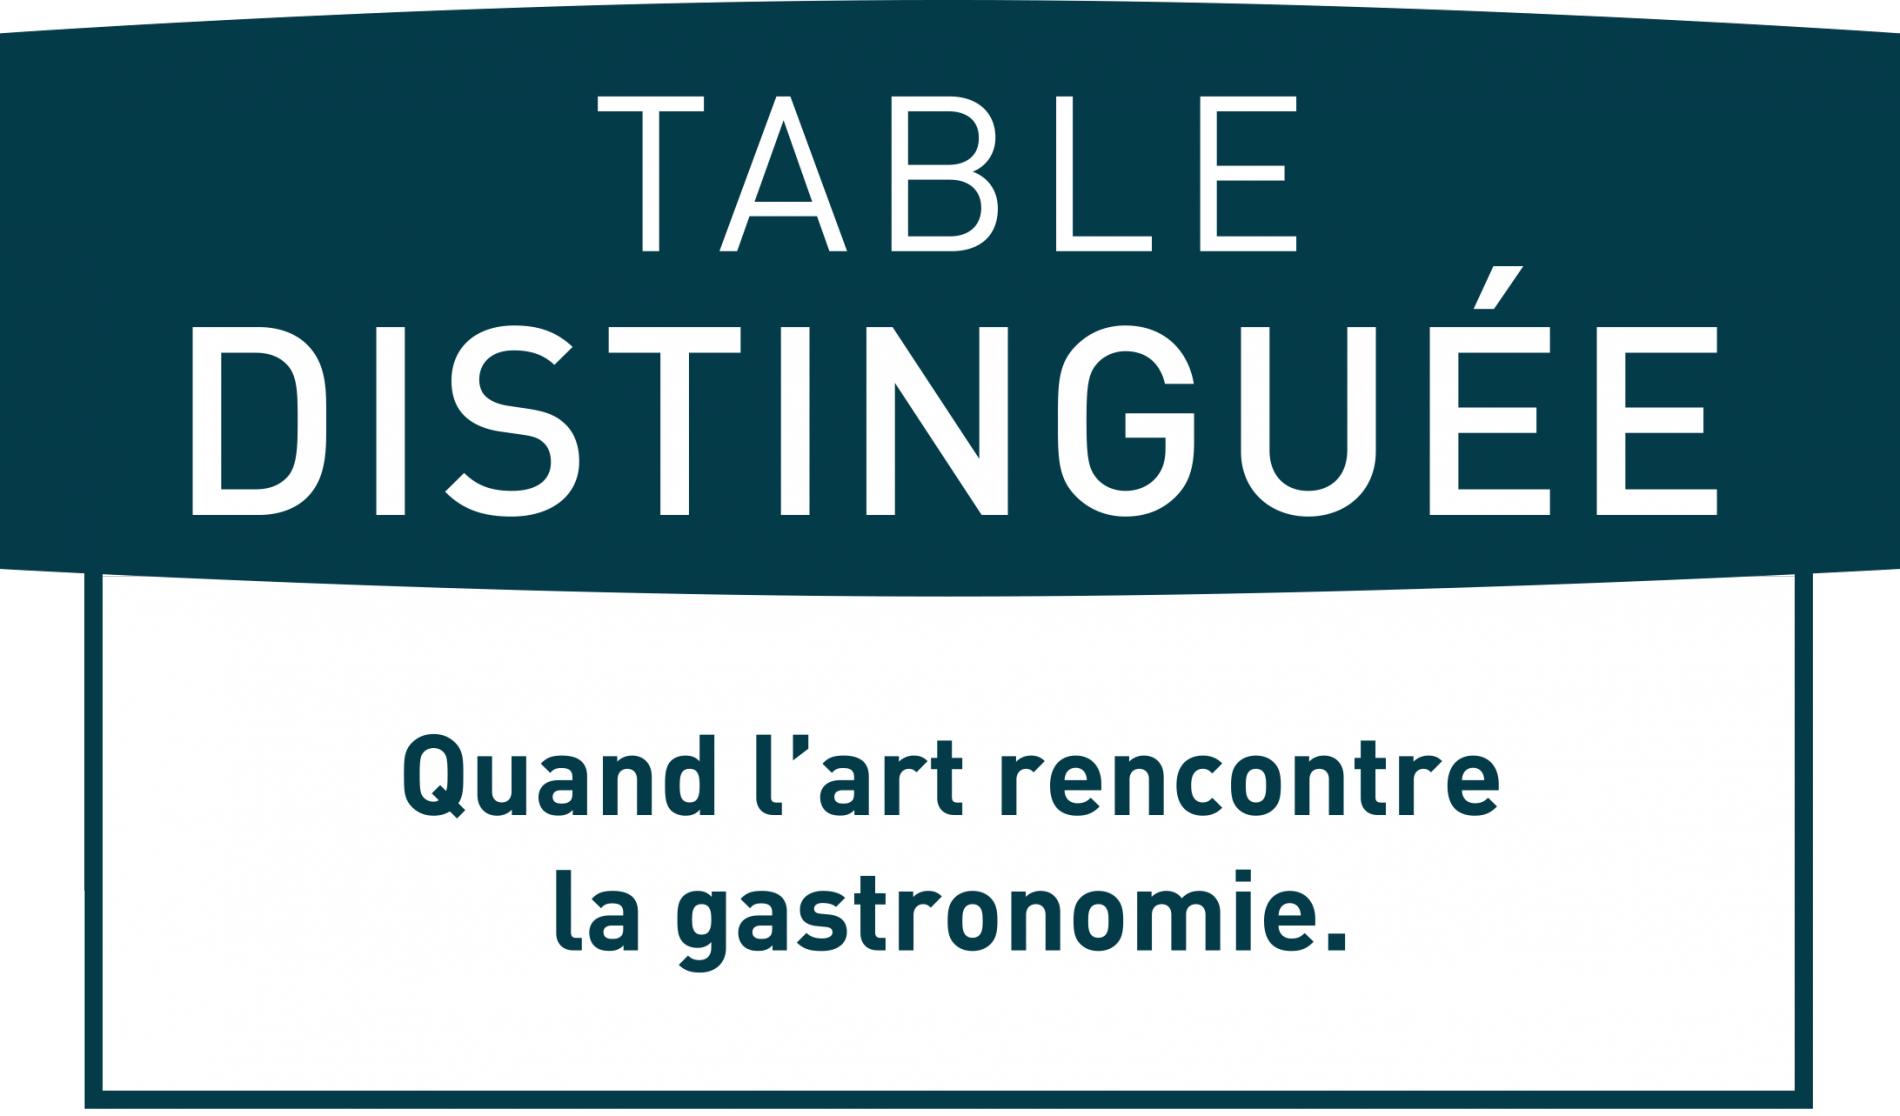 Logis Restaurant Table Distinguée